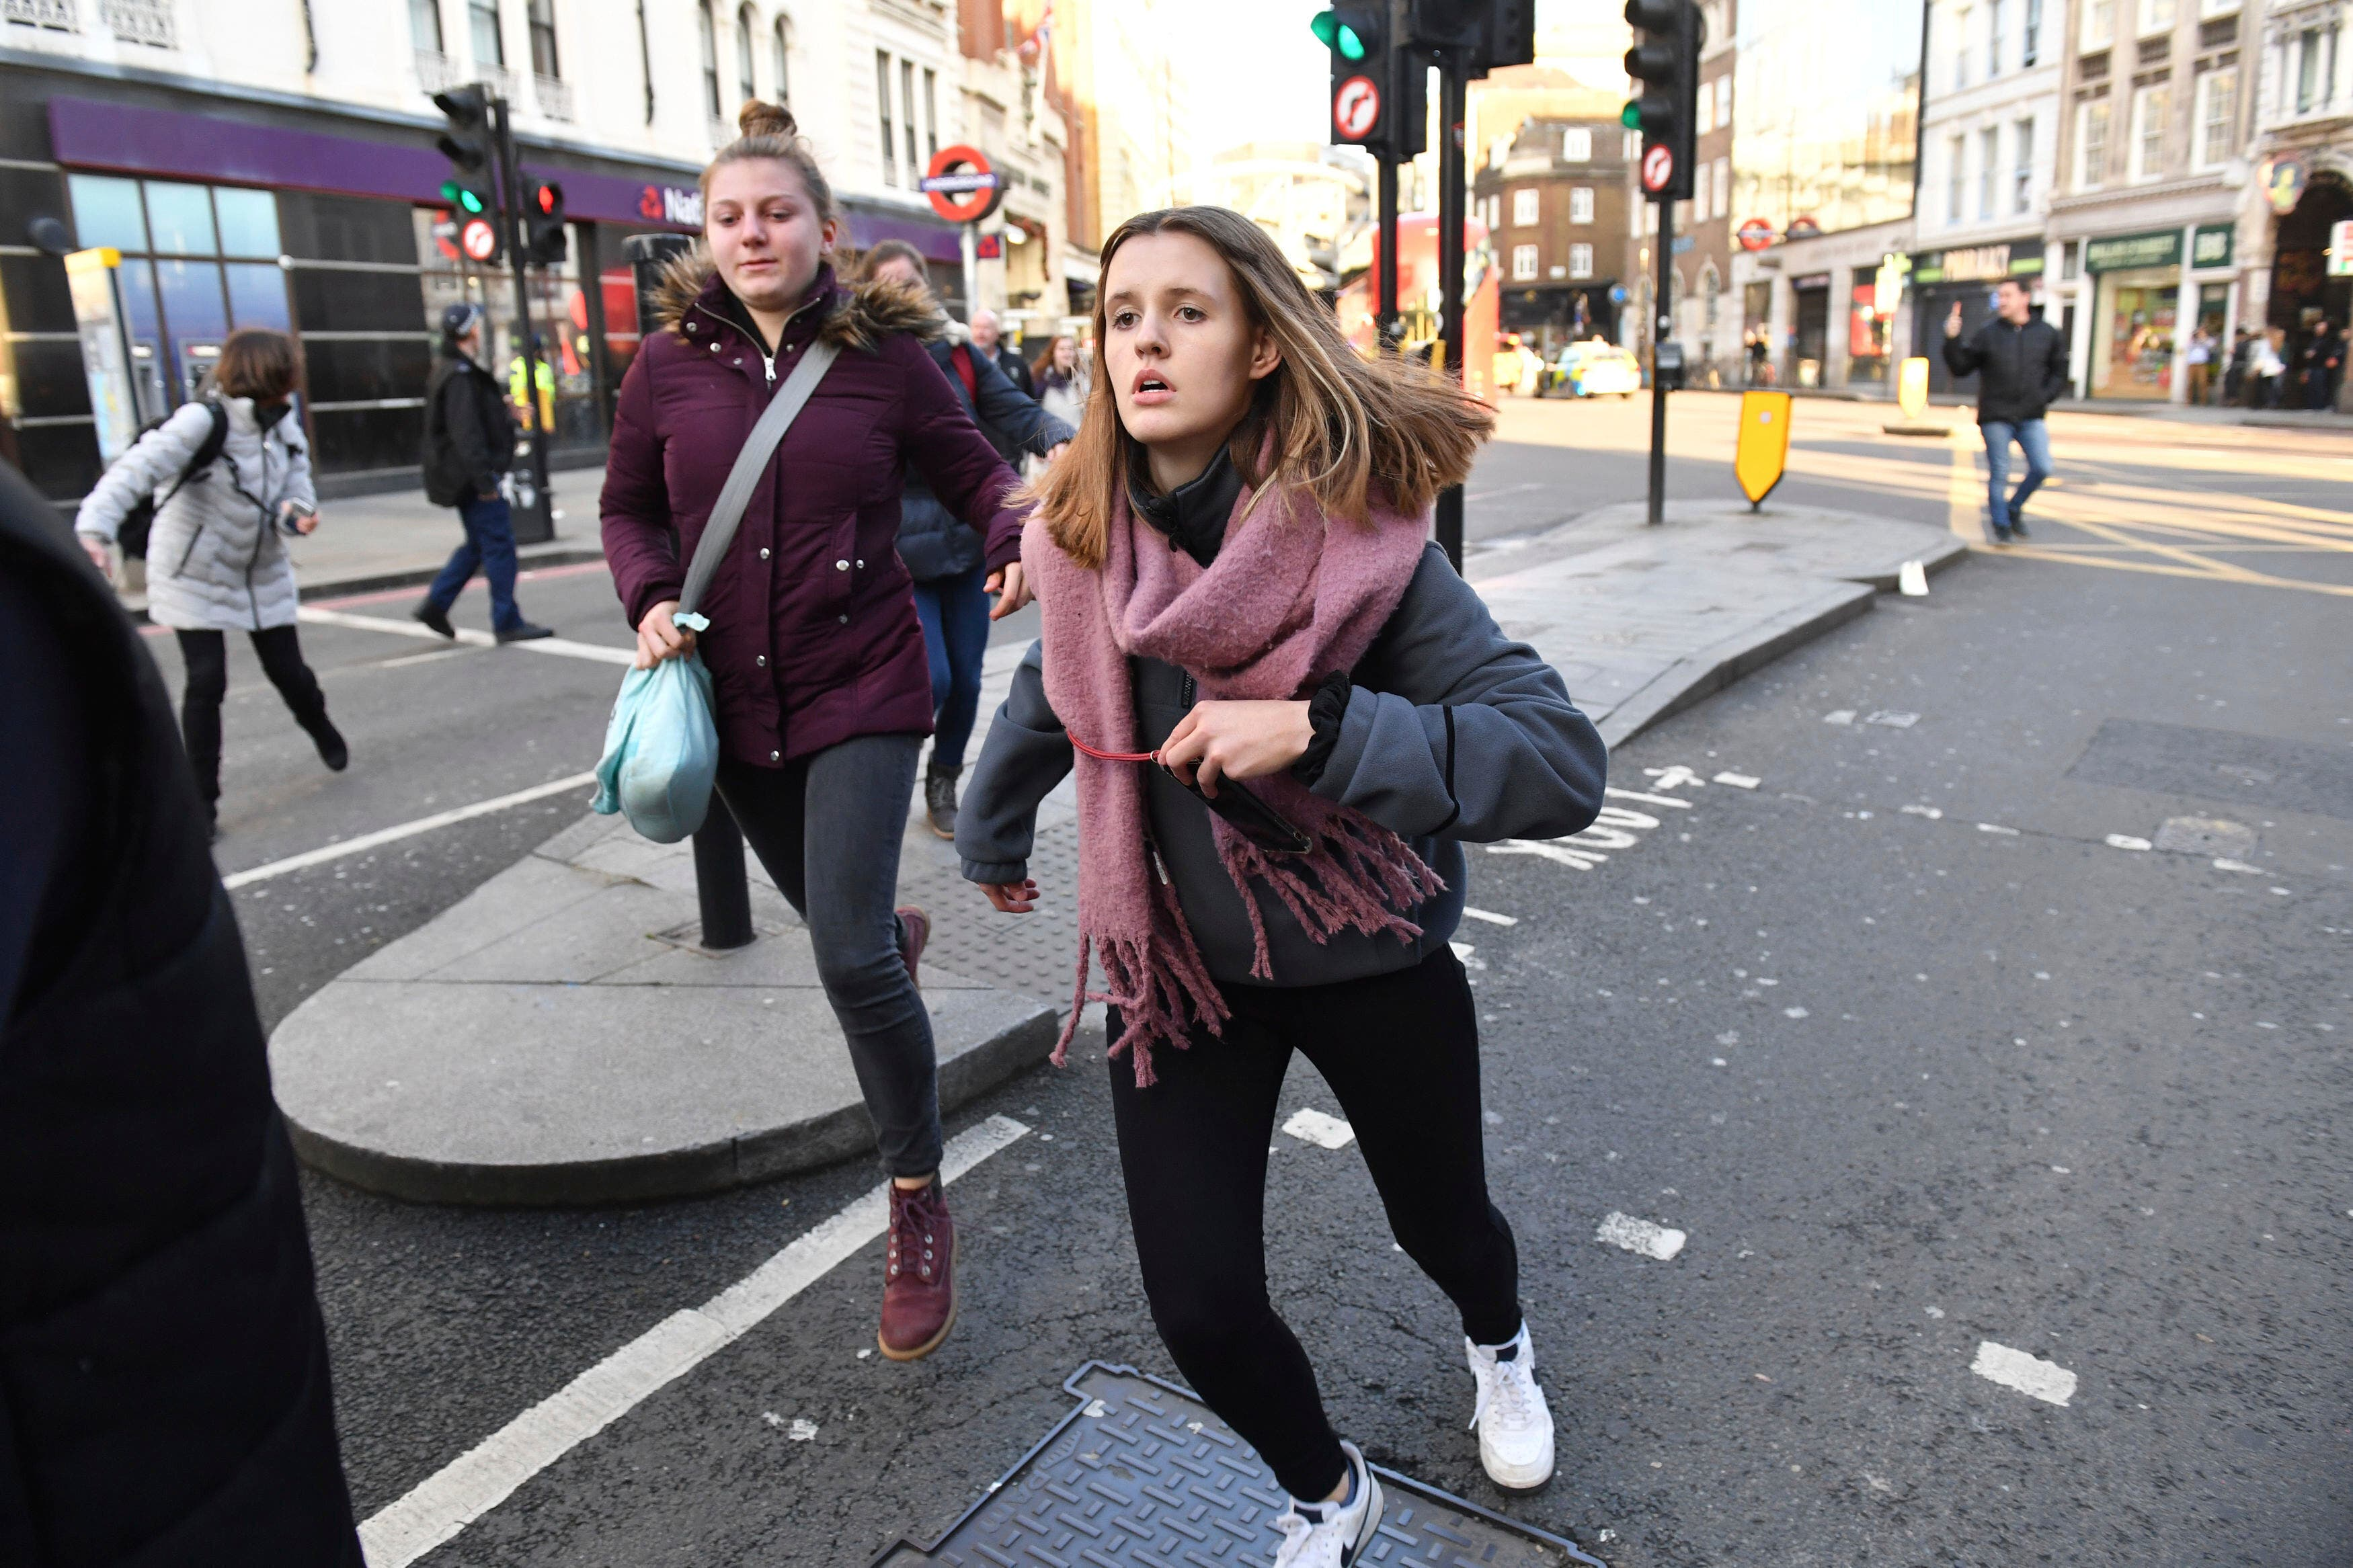 Video: Tiroteo en Puente de Londres